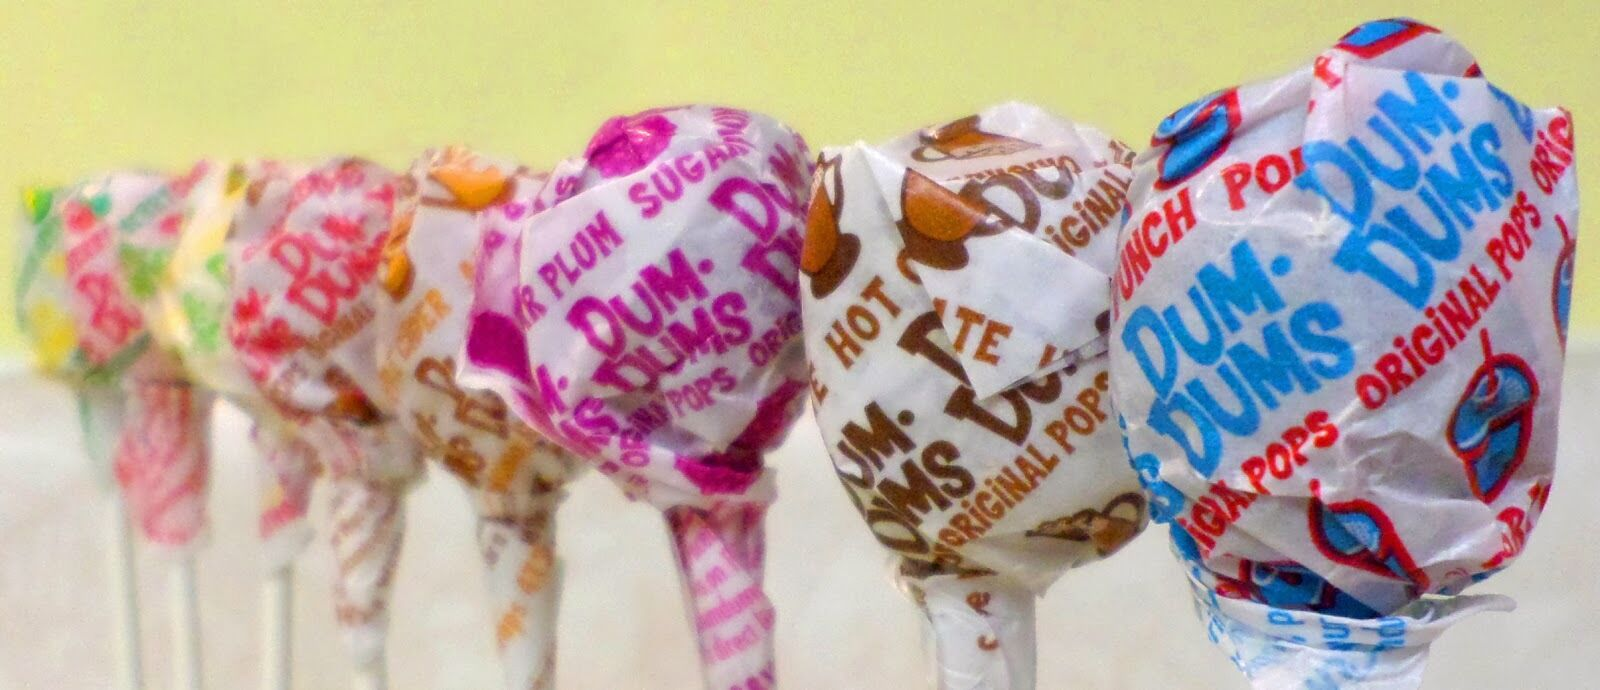 Sugarbaby's Things